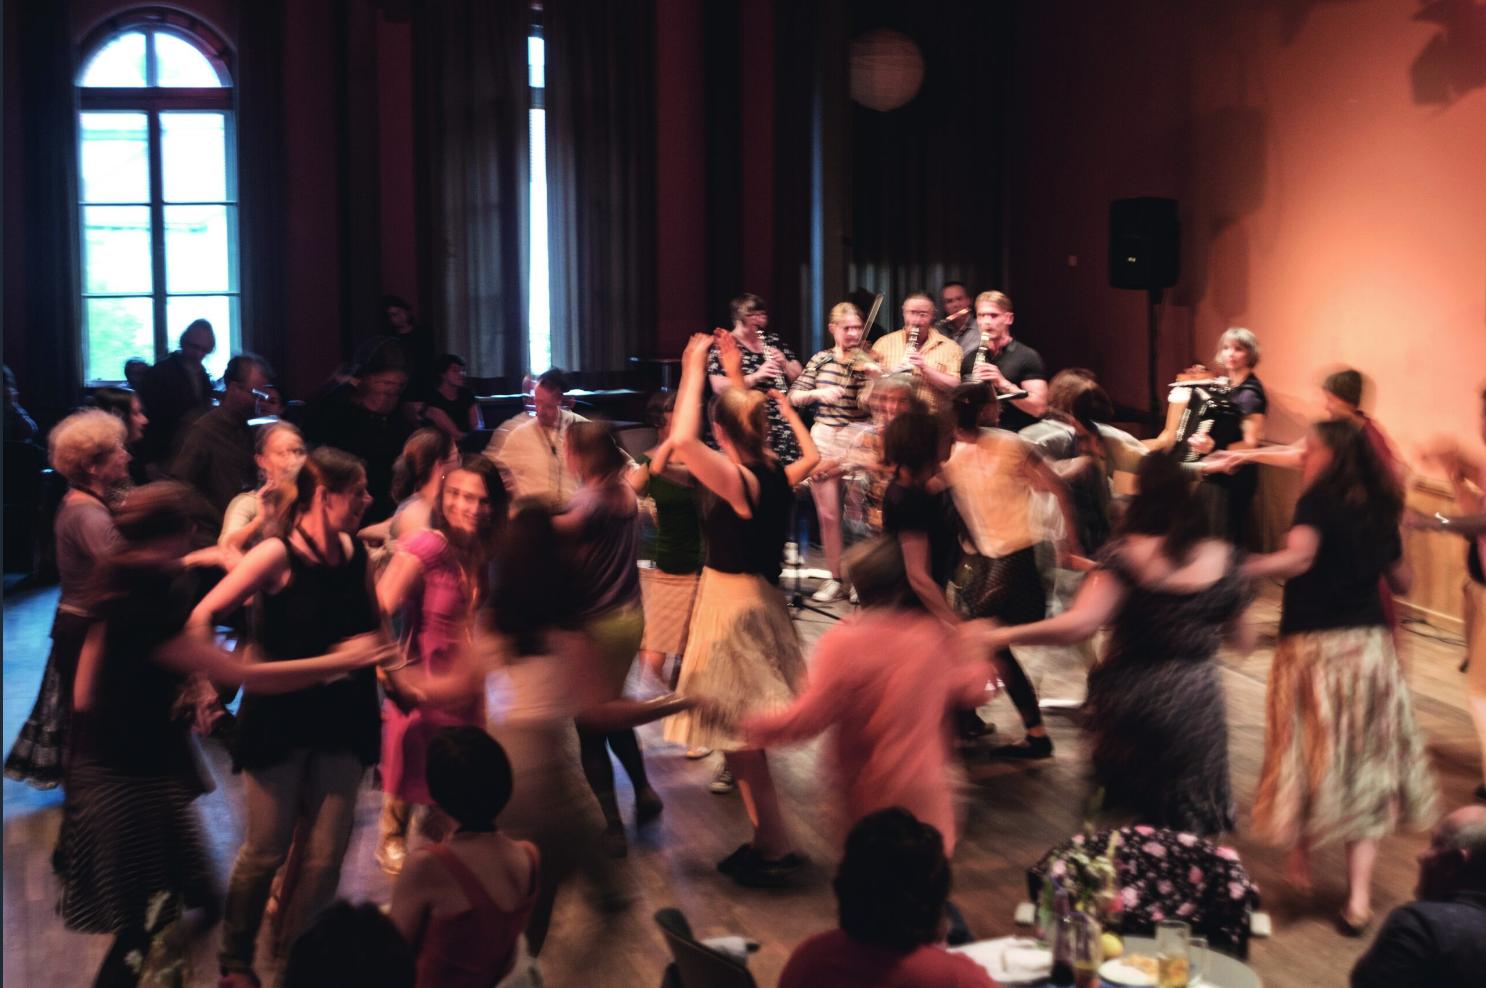 <p>Dance at Yiddish Summer Weimar (Photo: Yulia&nbsp;Kabakova)</p>